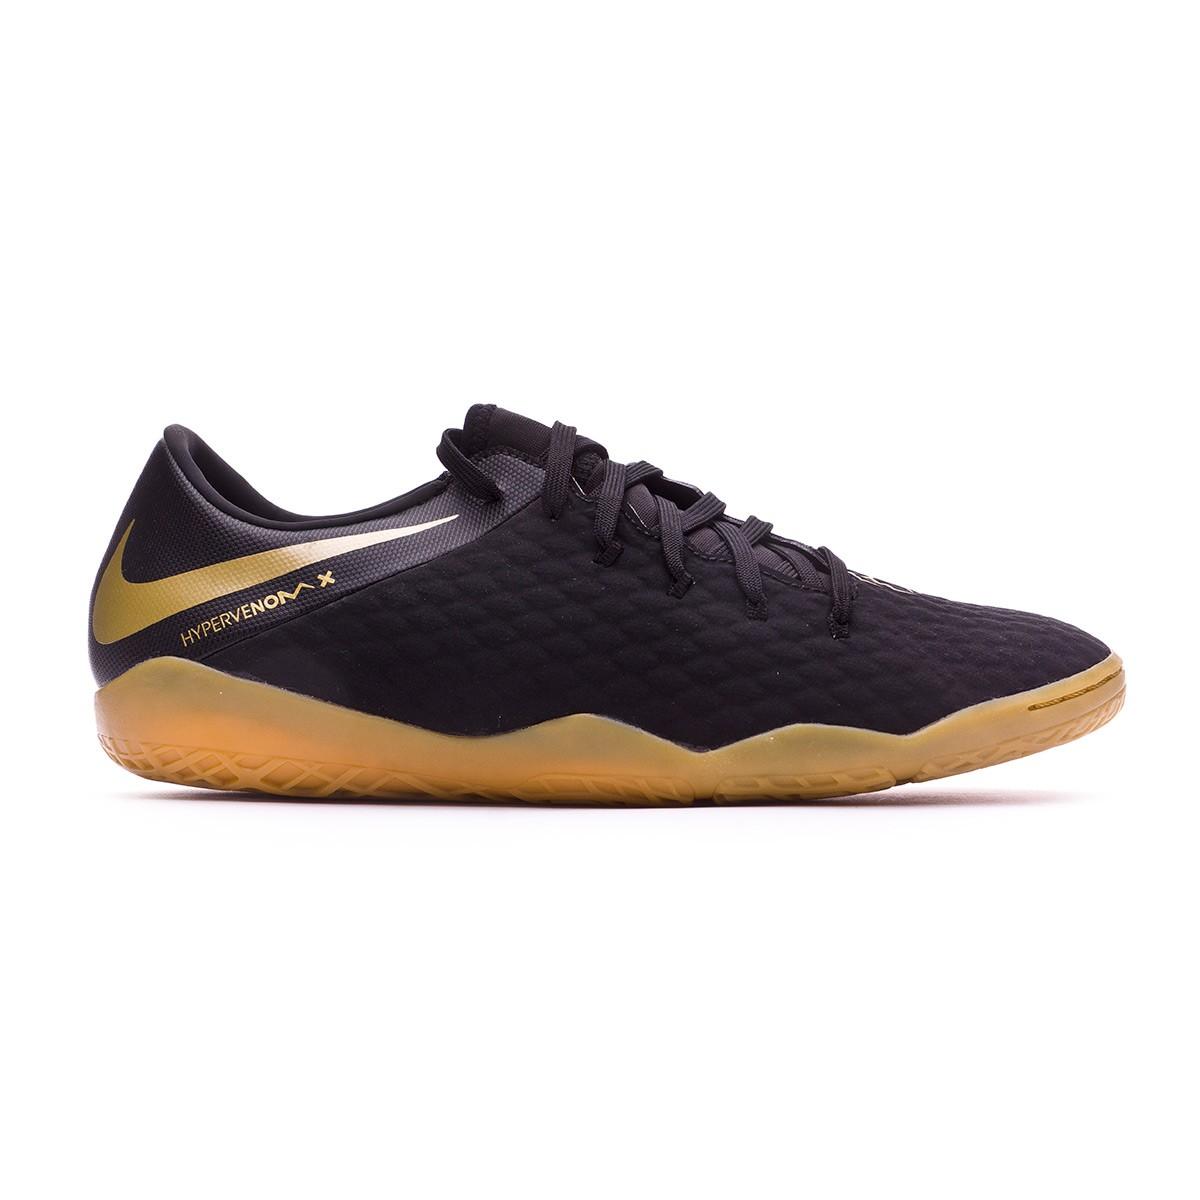 low priced 184c7 37139 Sapatilha de Futsal Nike Hypervenom PhantomX III Academy IC Black-Metallic  vivid gold - Loja de futebol Fútbol Emotion